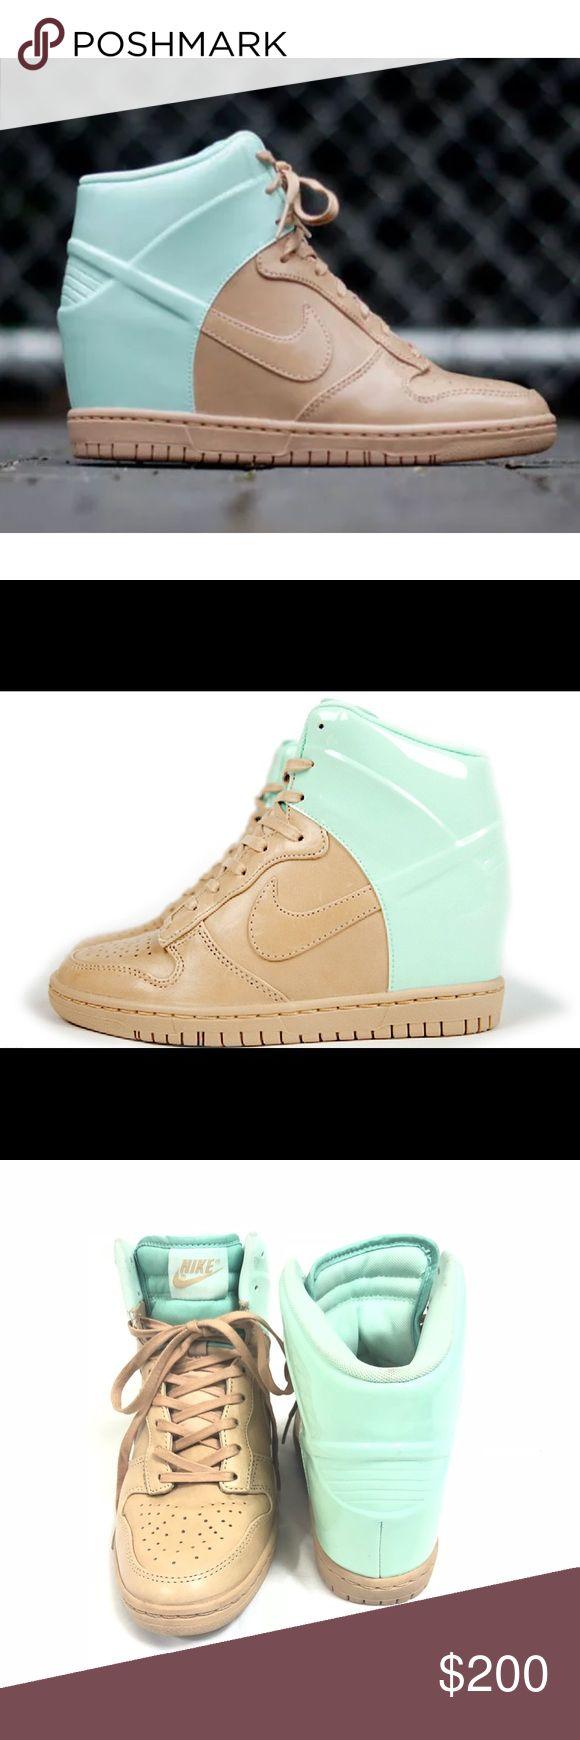 4d1e7486aa59 ... denmark nike dunk sky hi vt qs womens wedge sneakers 2013 e0ba5 8cf47